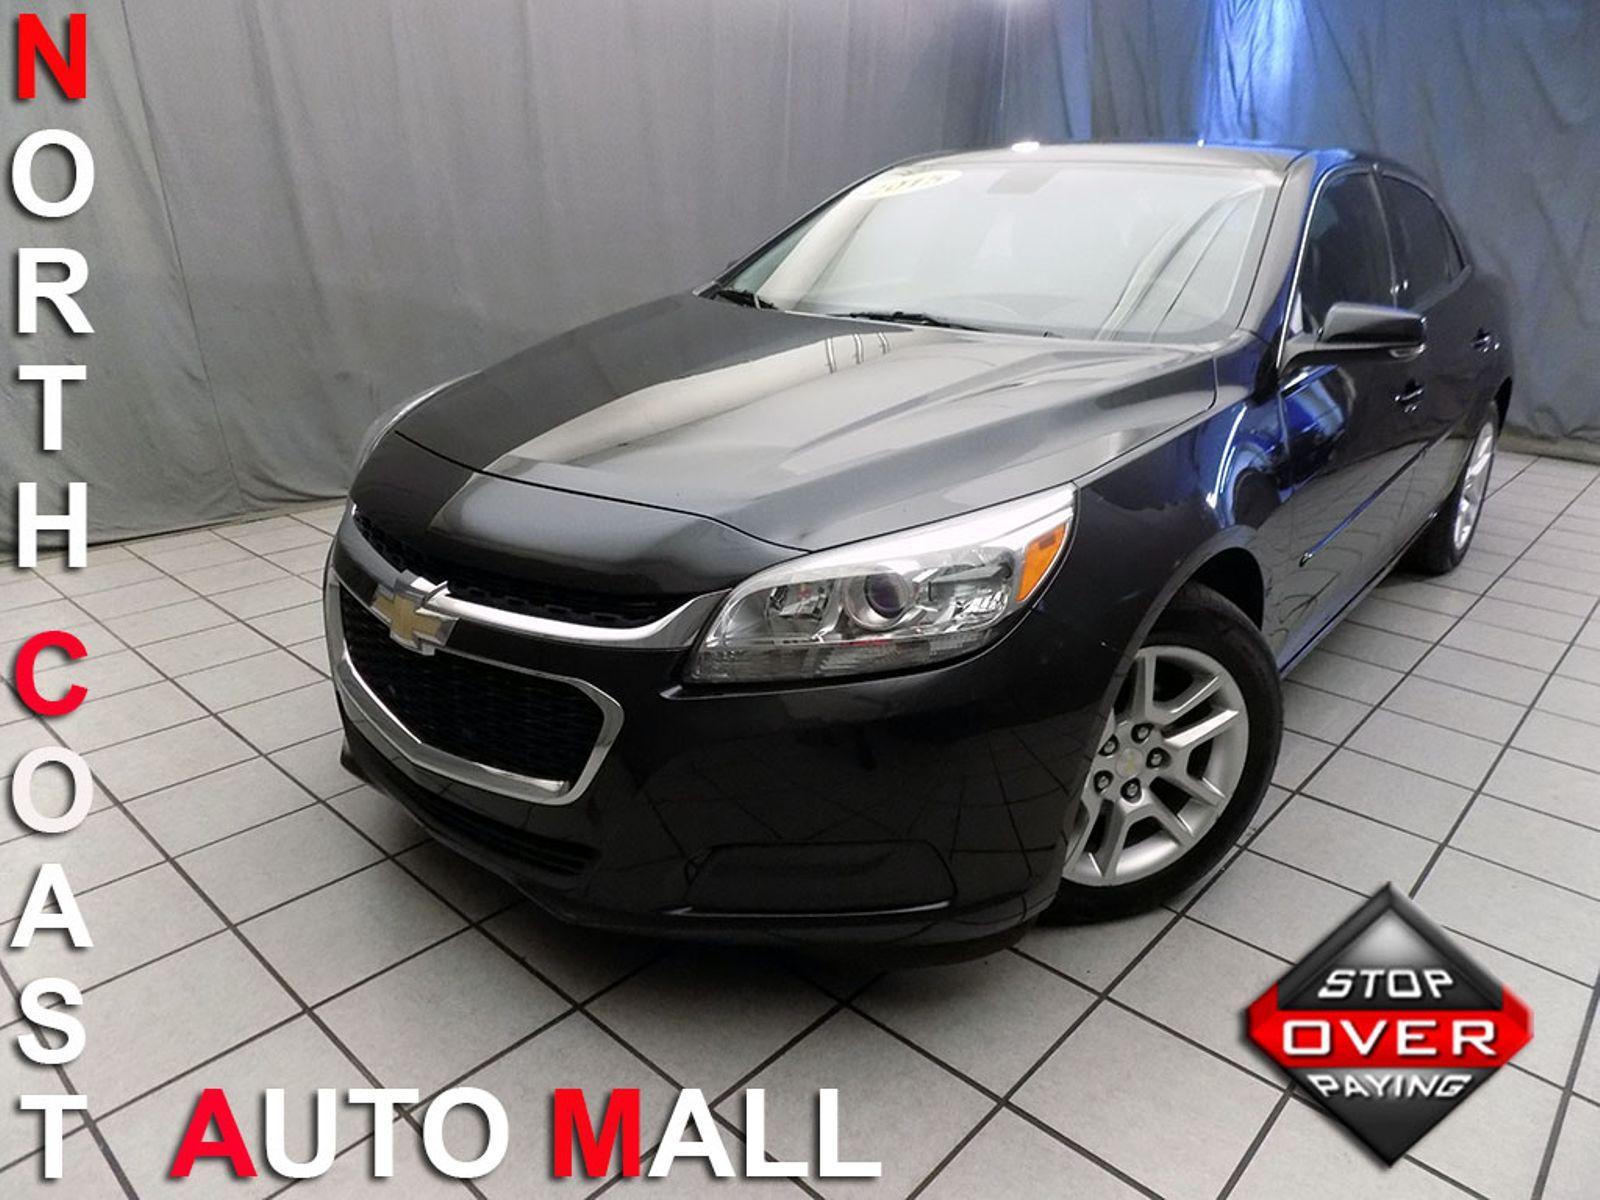 2015 Chevrolet Malibu LT city Ohio North Coast Auto Mall of Cleveland